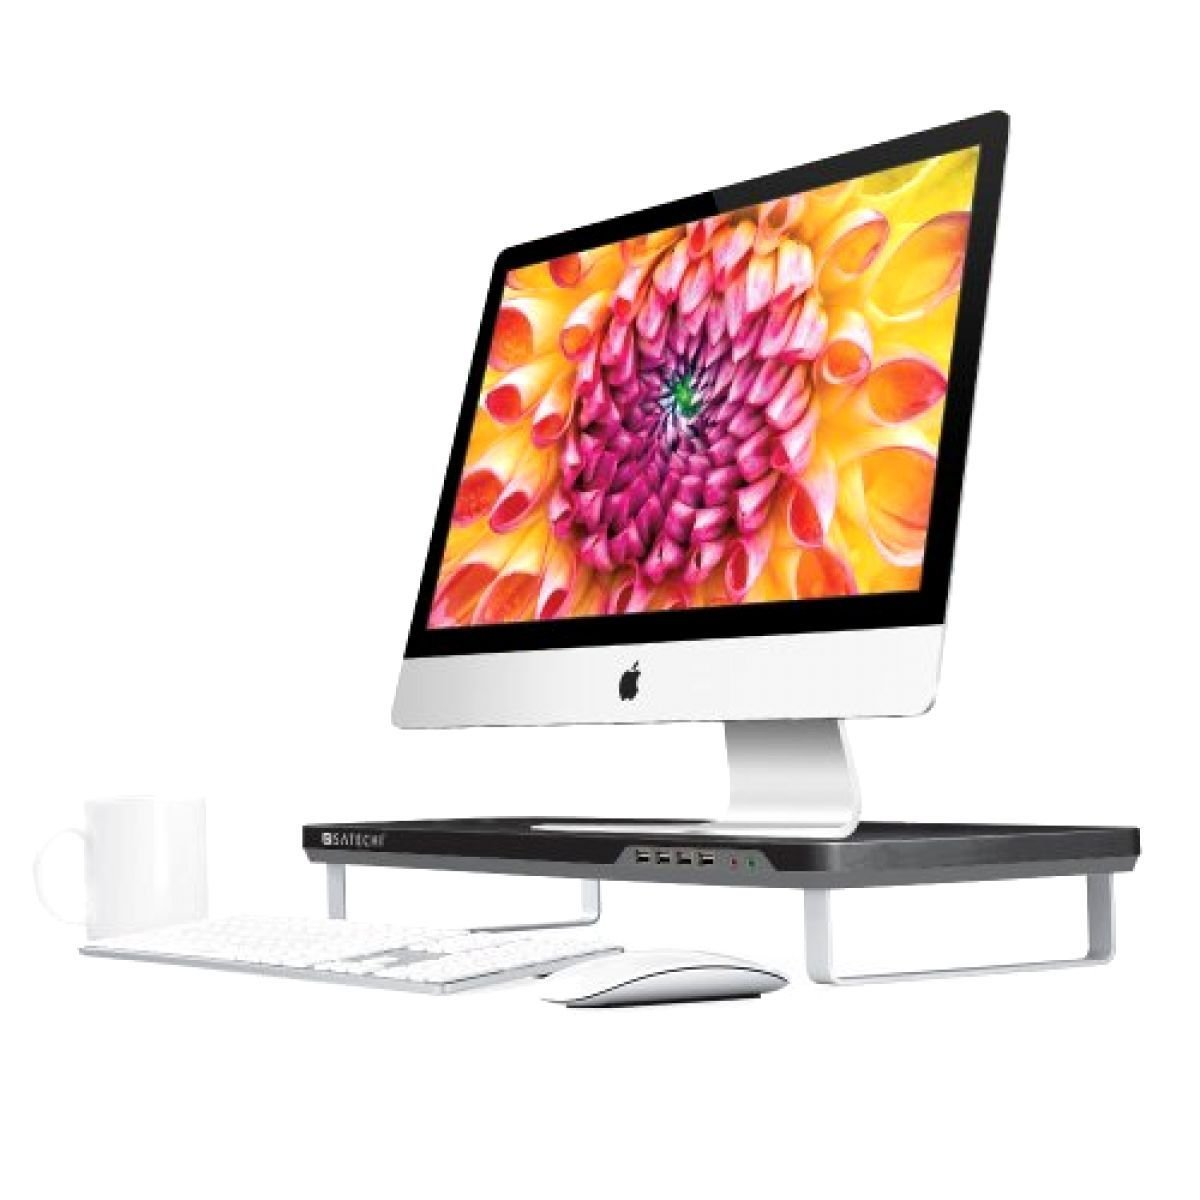 Computer iMac Laptop Pad Desktop Workspace Monitor Riser Adjustable Stand